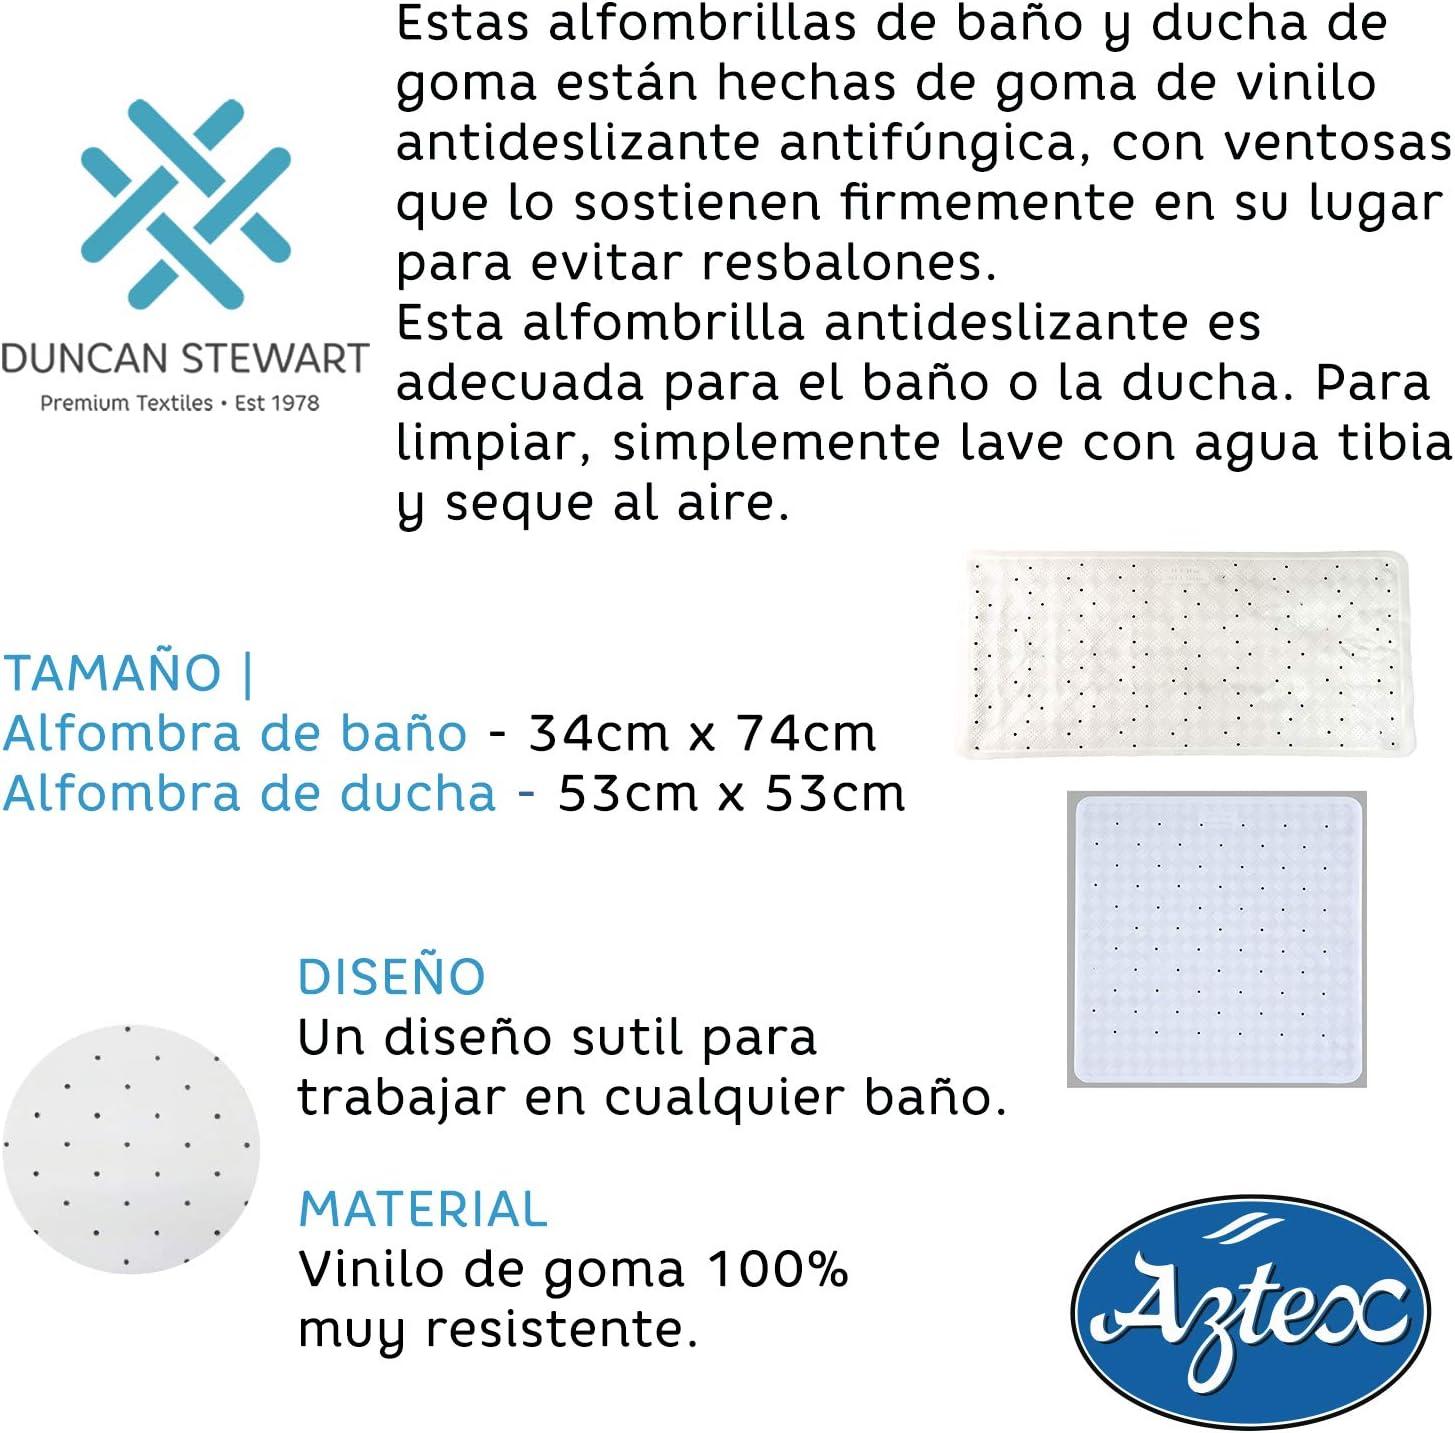 aztex Alfombra De Ba/ño o Ducha con Clips De Ventosa Gris Alfombra de Ducha Vinilo